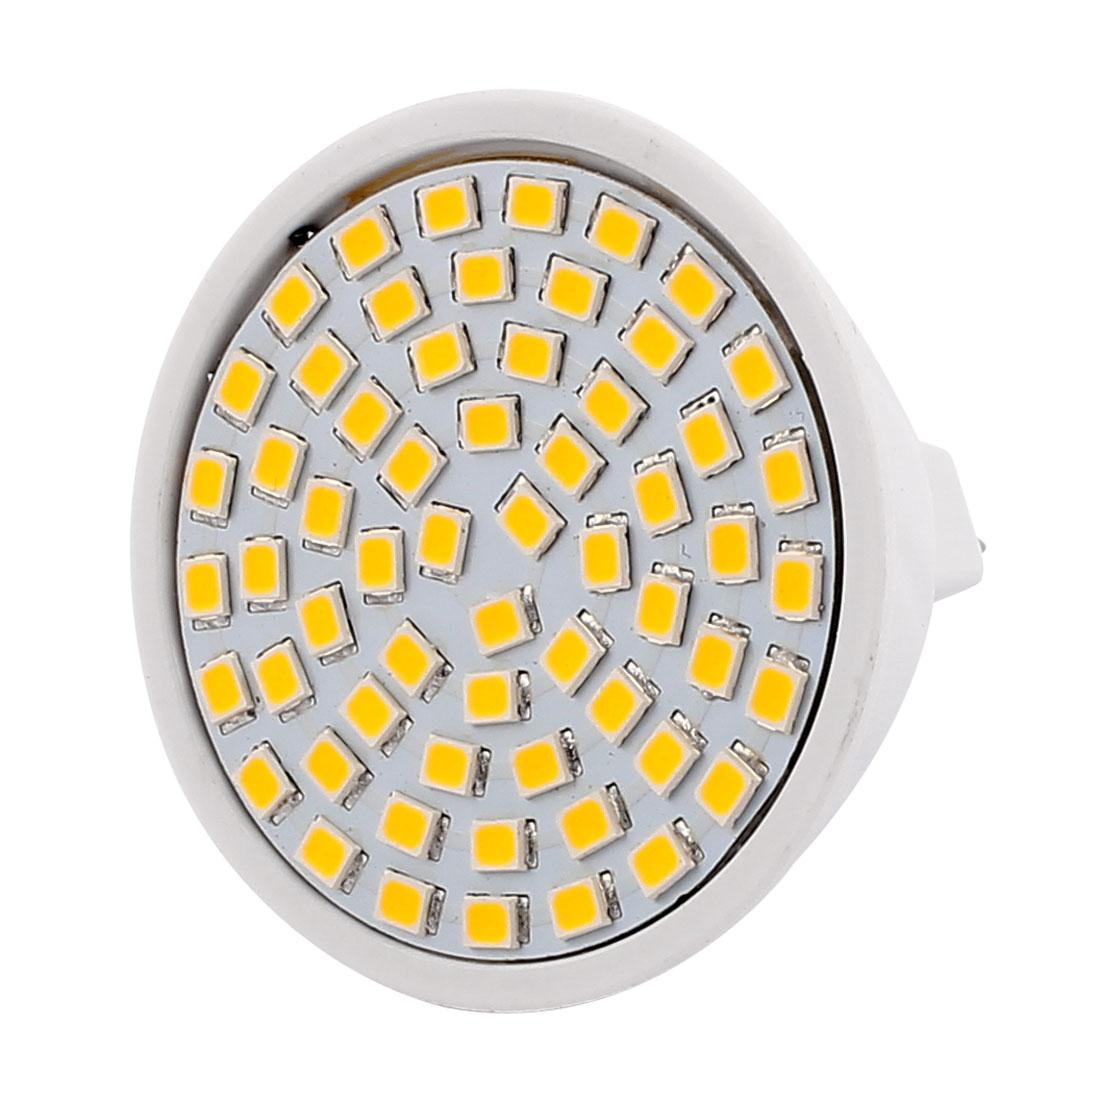 MR16 SMD 2835 60 LEDs Plastic Energy-Saving LED Lamp Bulb Warm White AC 220V 6W